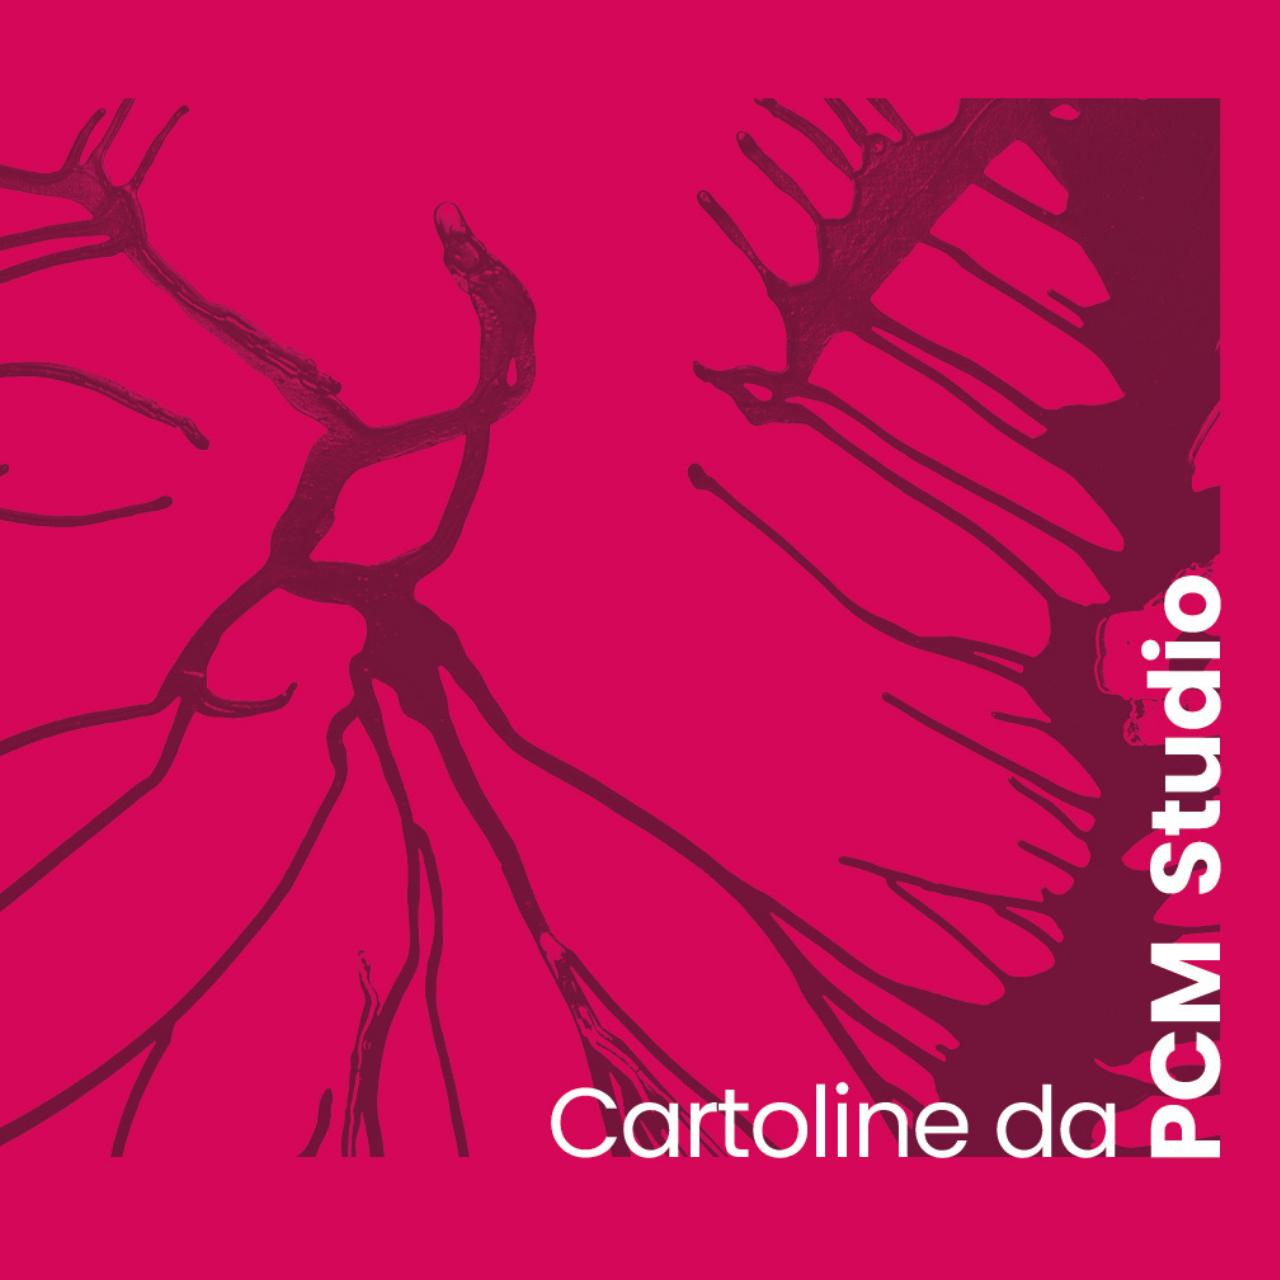 Cartoline                                   da PCM Studio